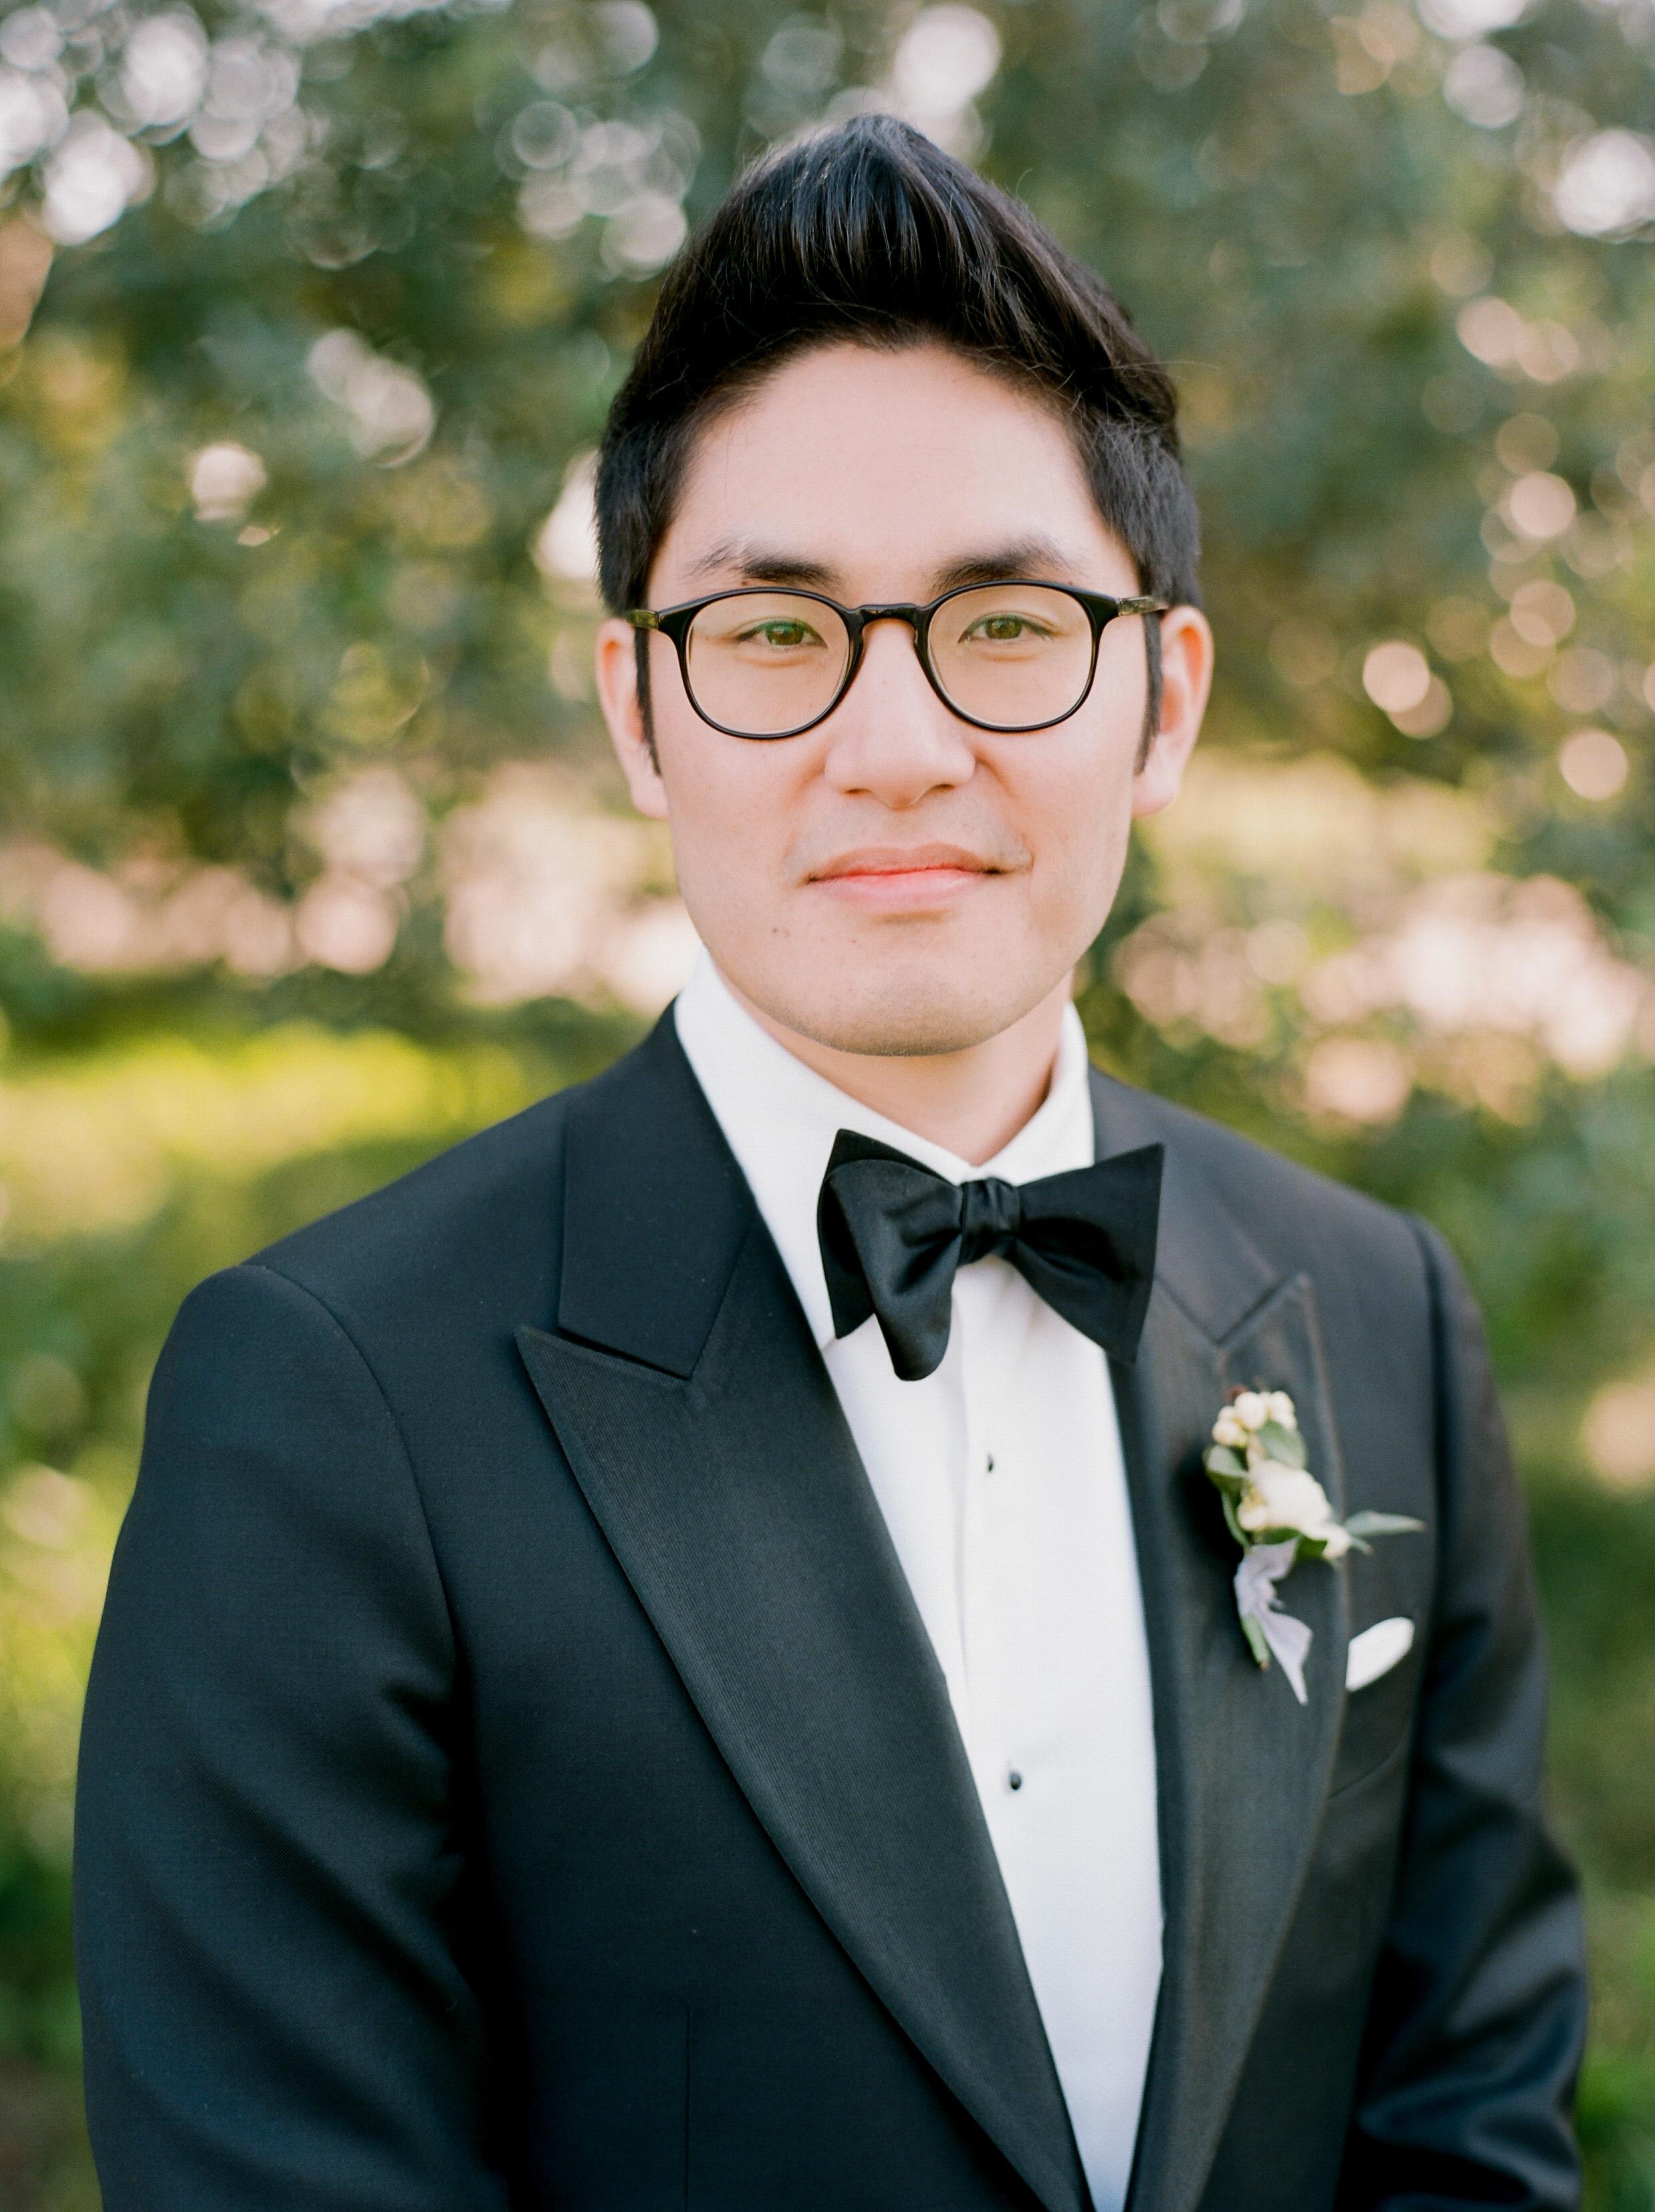 Martha-Stewart-Wedding-Dana-Fernandez-Photography-Josh-Texas-Film-Houston-Wedding-Fine-Art-Photographer-McGovern-Centennial-Gardens-Top-Best-190.jpg